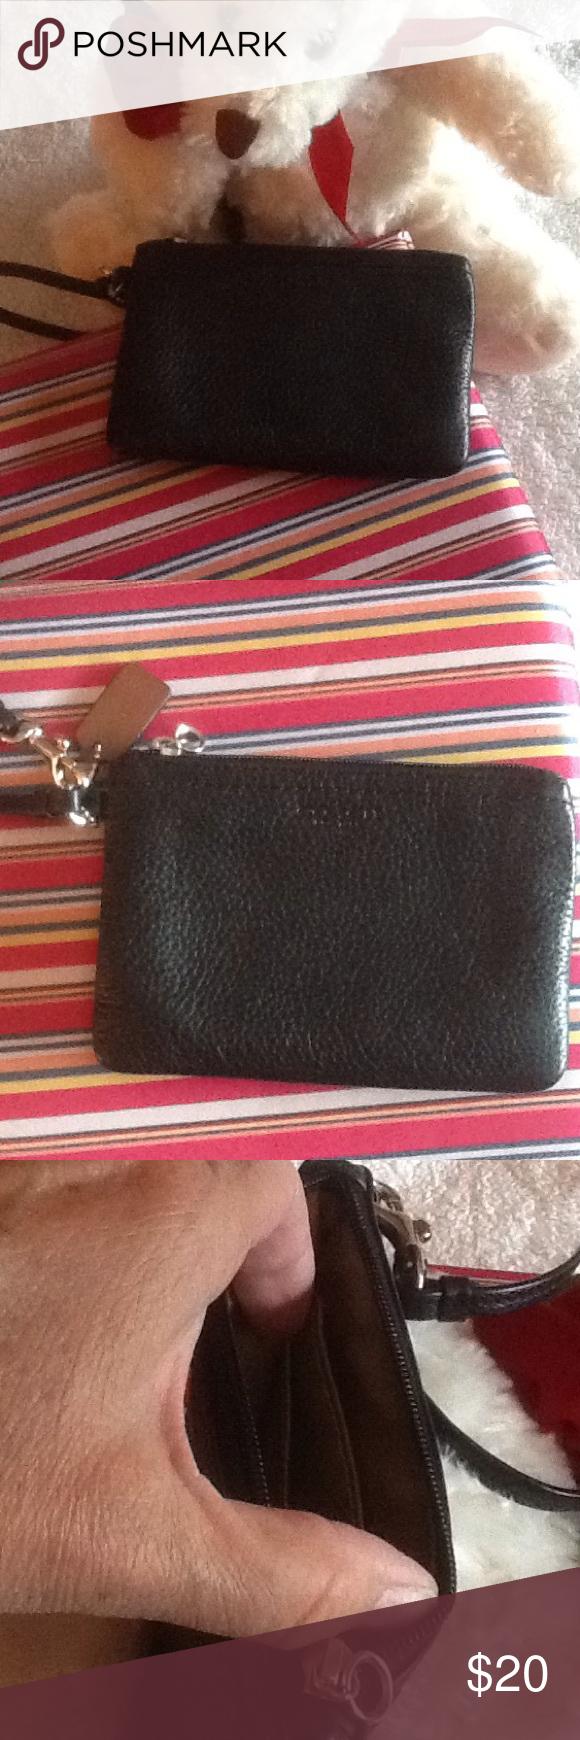 "Coach wristlet purse Black leather Coach with two inside slip pockets zipper close 6""x4"" Coach Bags Clutches & Wristlets"